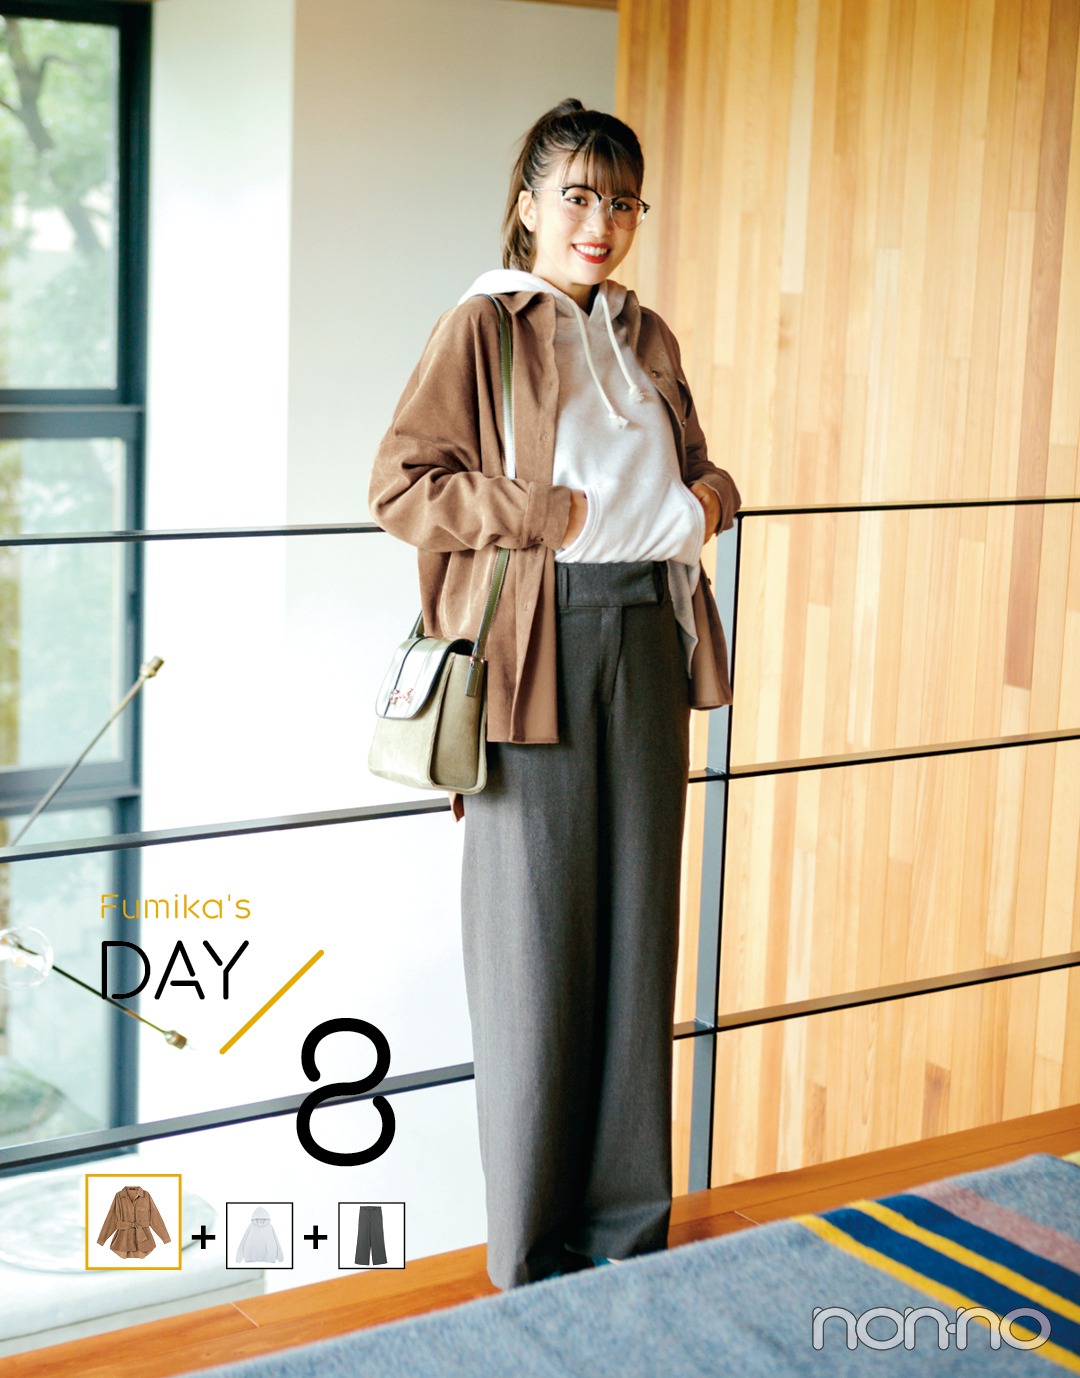 Fumika's DAY8